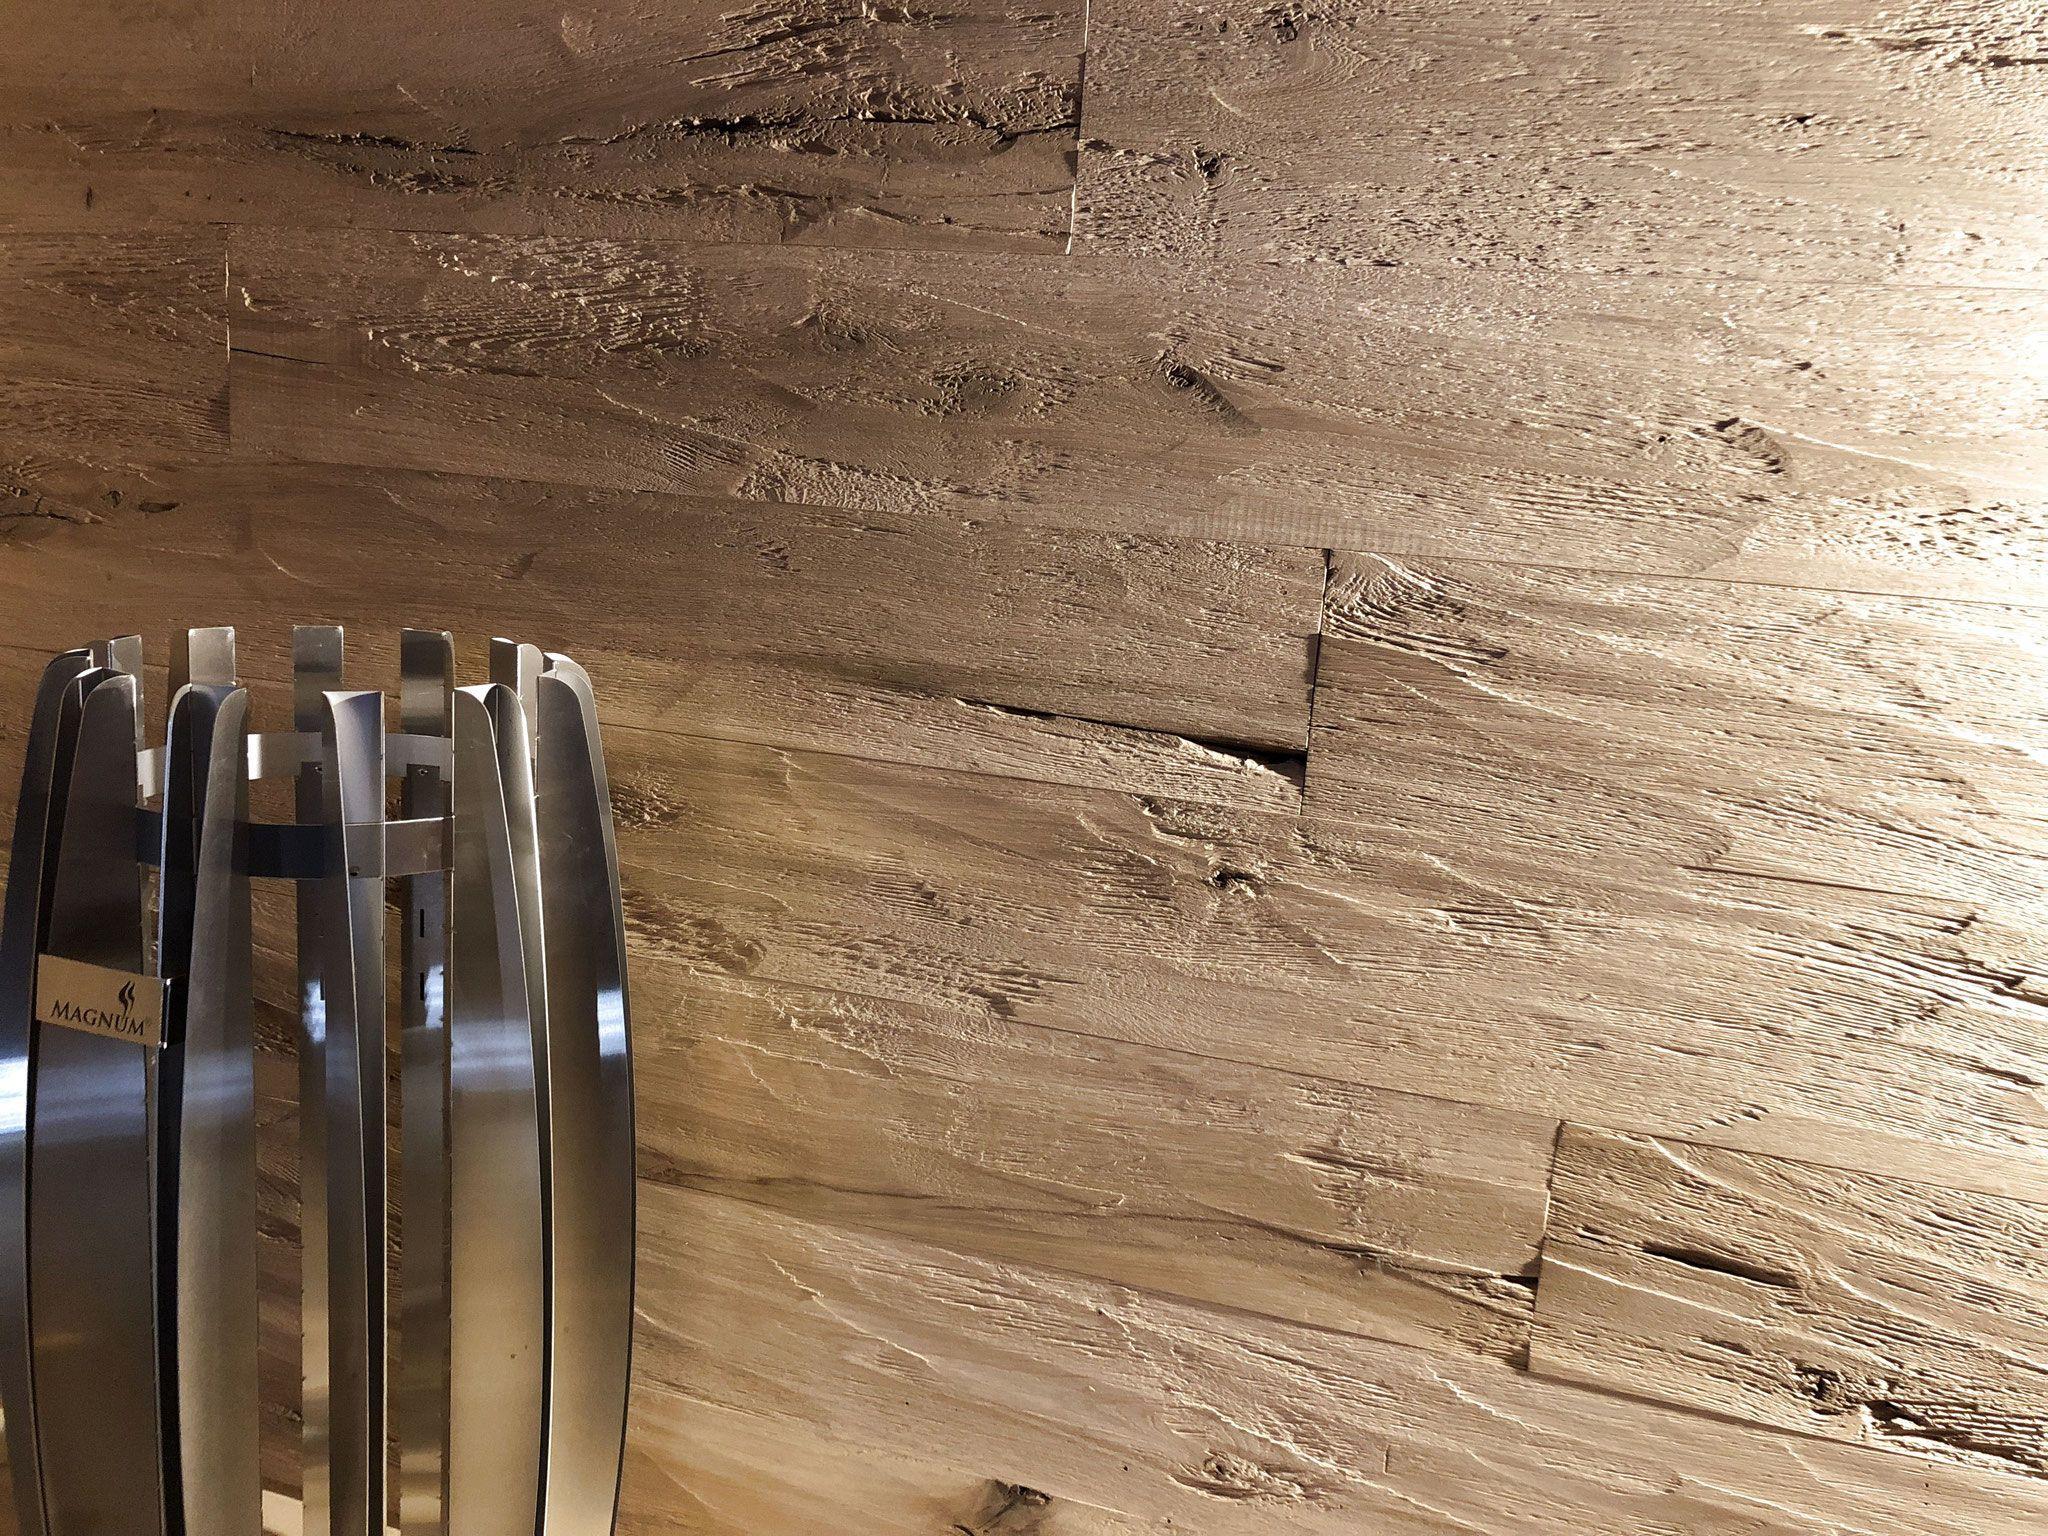 Rustikale Wandverkleidung Eiche Gehackt Geburstet Vintage Holz In 2020 Altholz Wandverkleidung Wandverkleidung Wandpaneele Holz